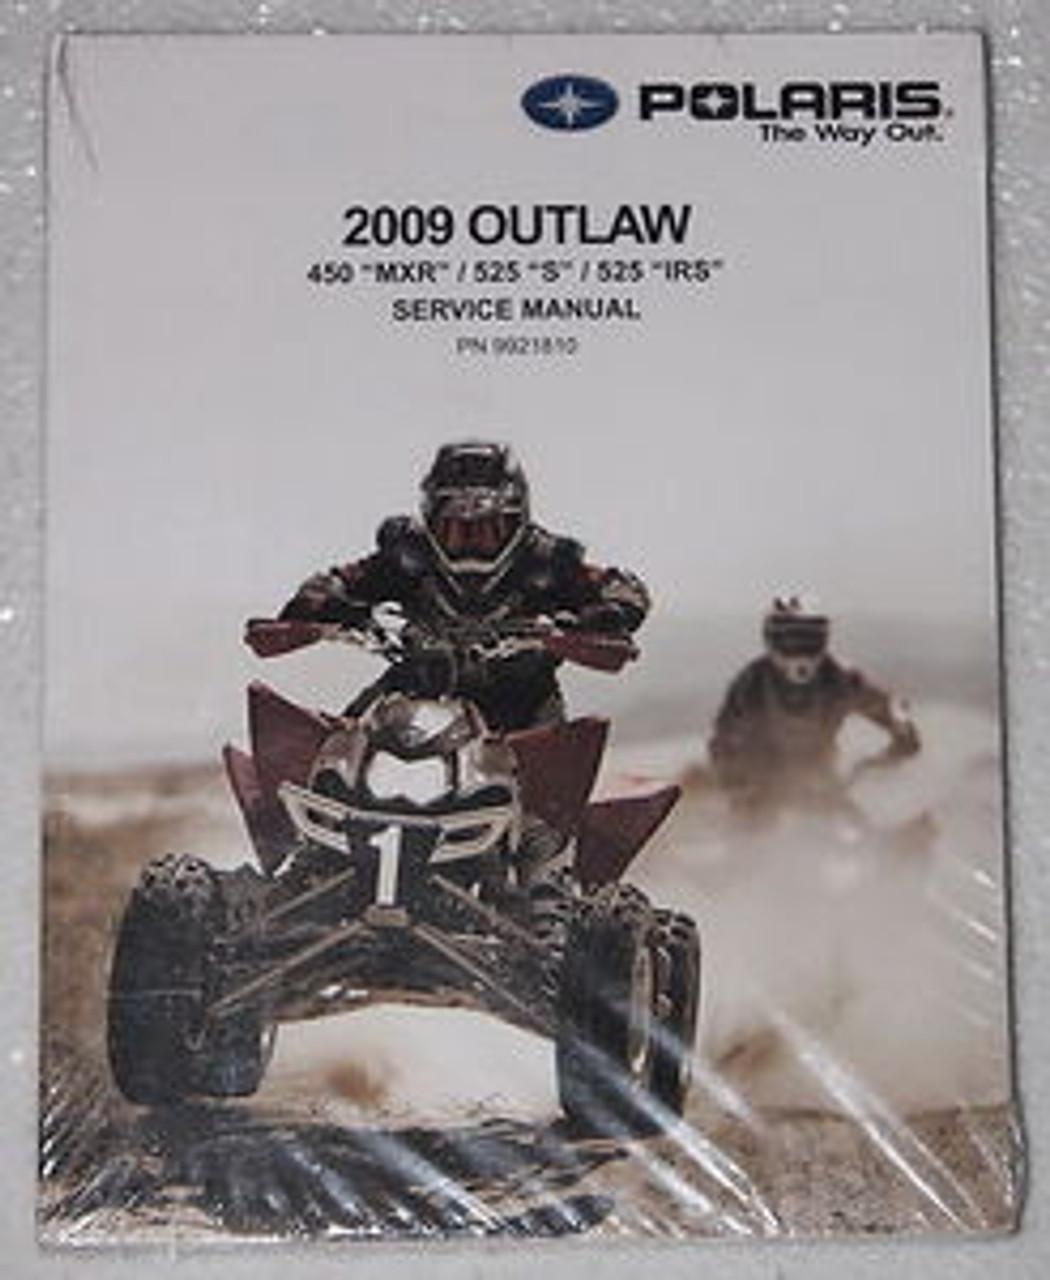 2009 Polaris Outlaw 525 S Irs 450 Mxr Service Manual Atv